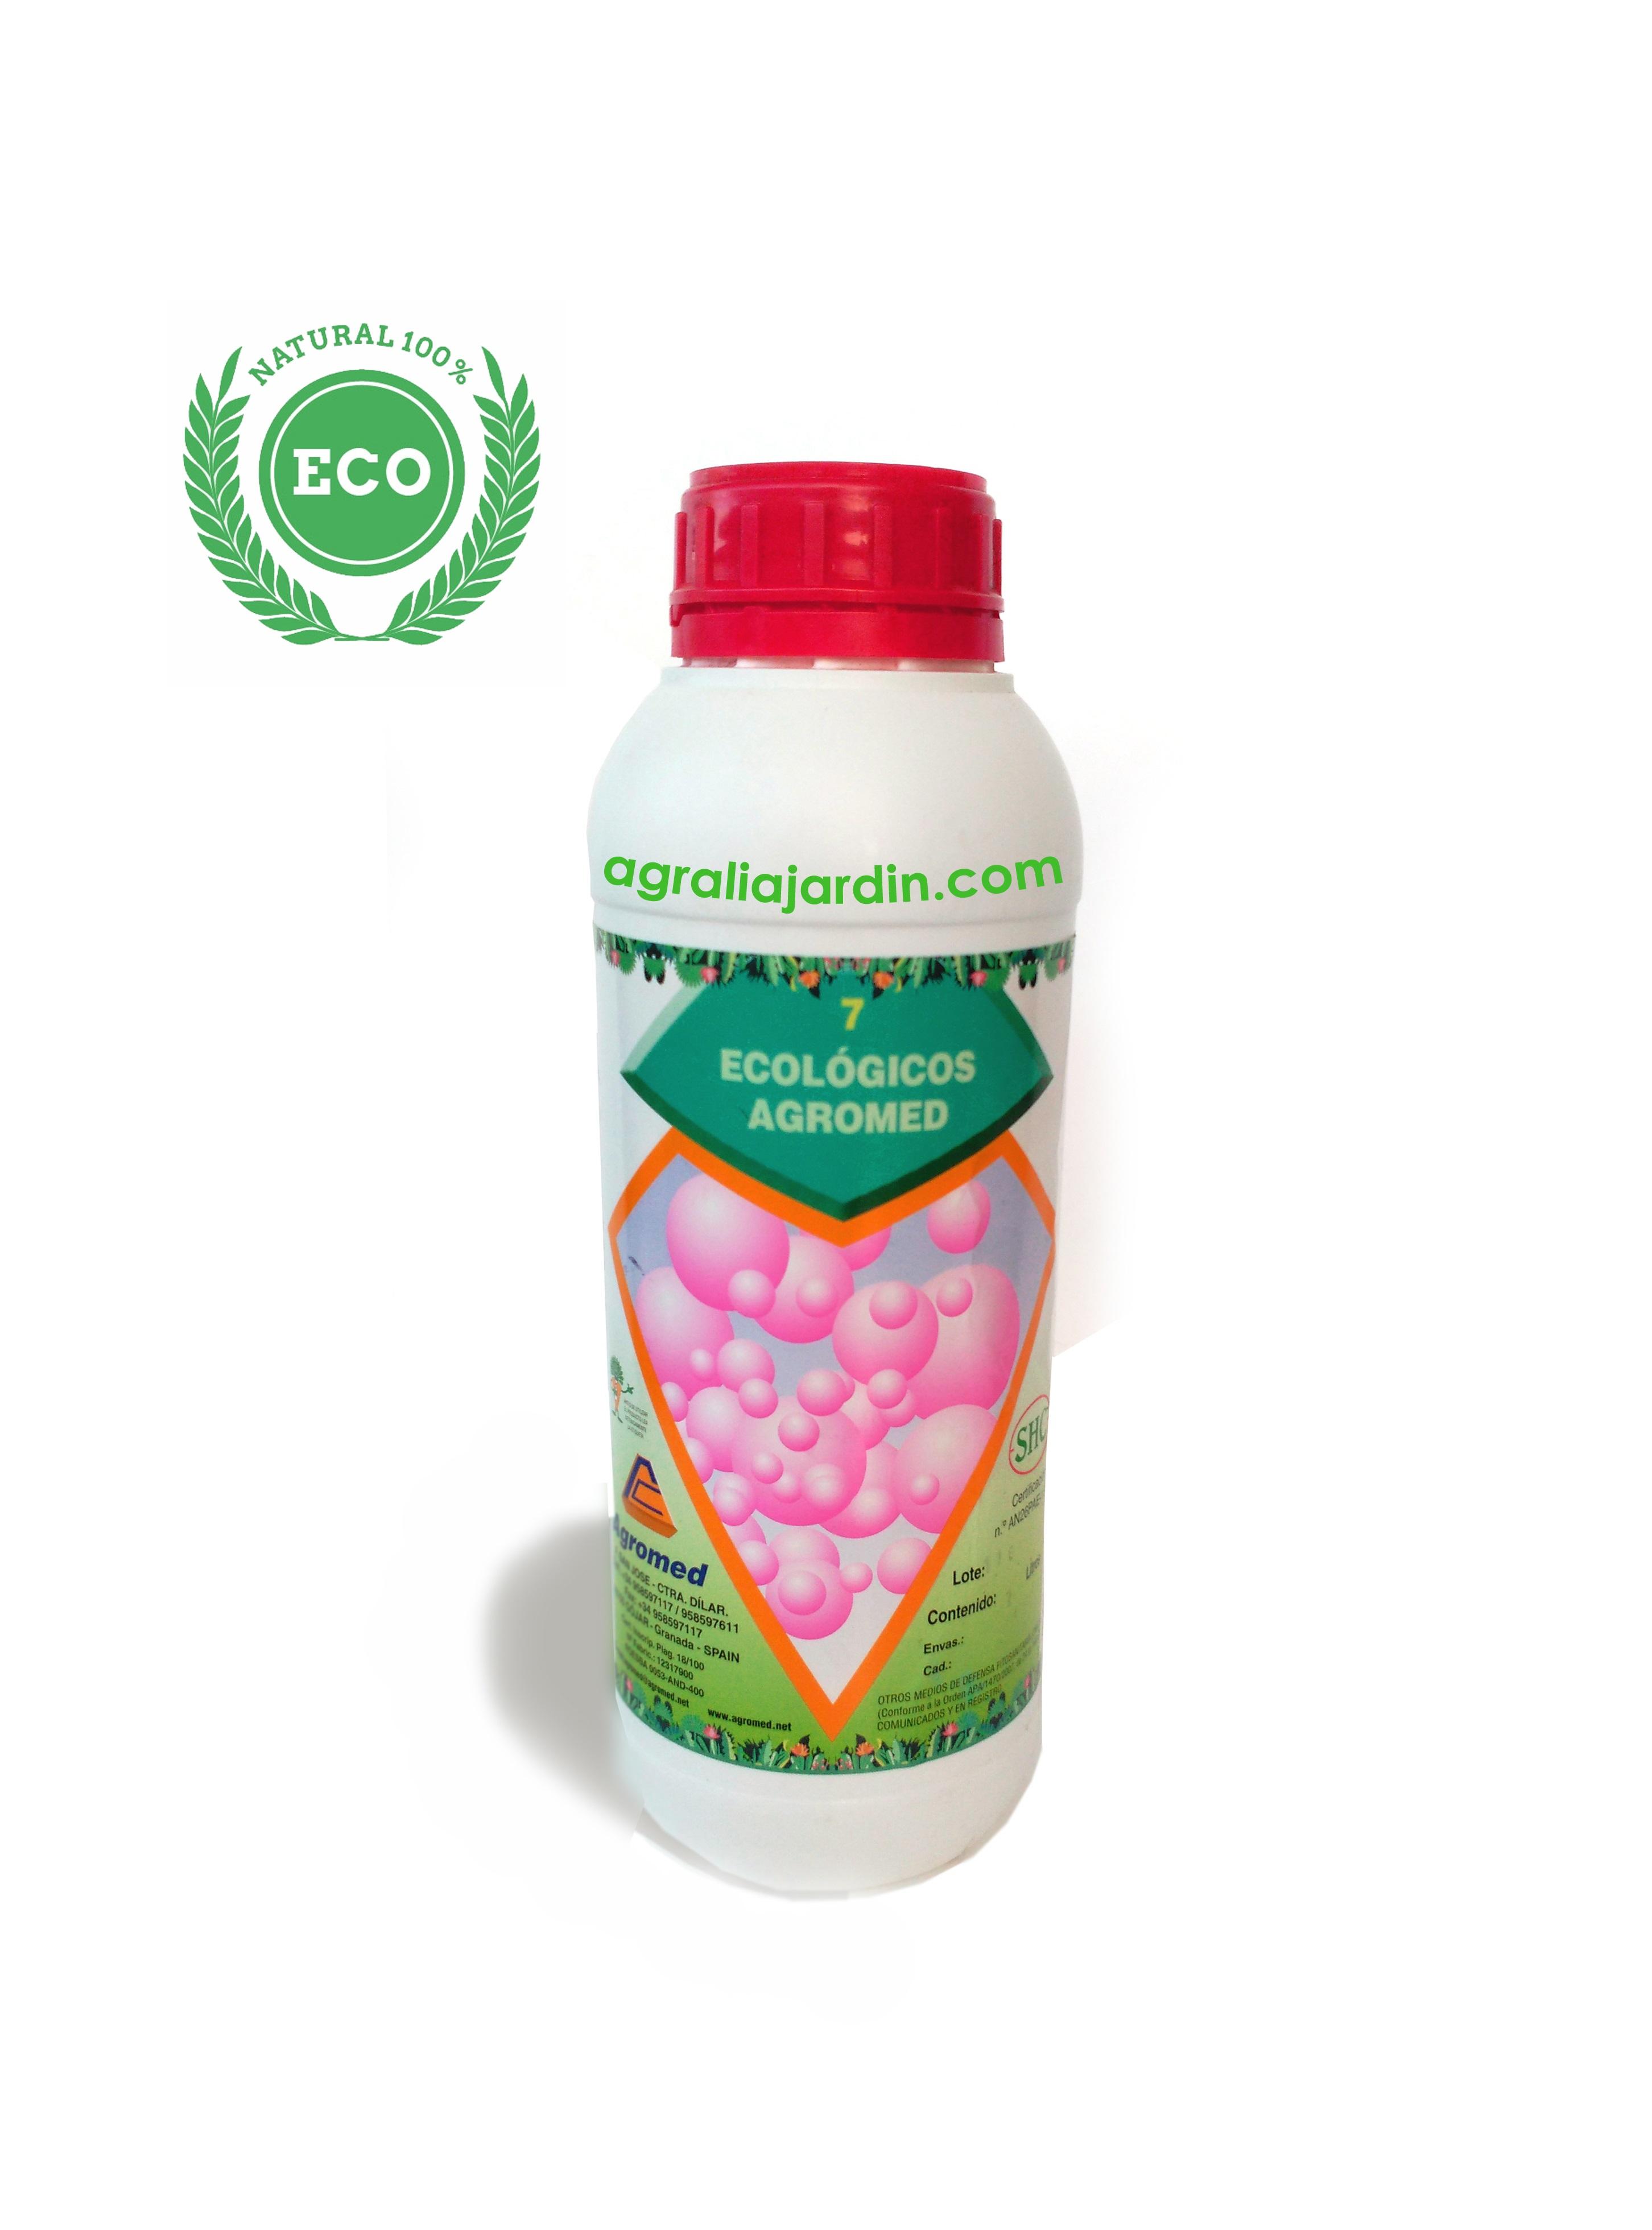 jabon potasico ecologico agromed